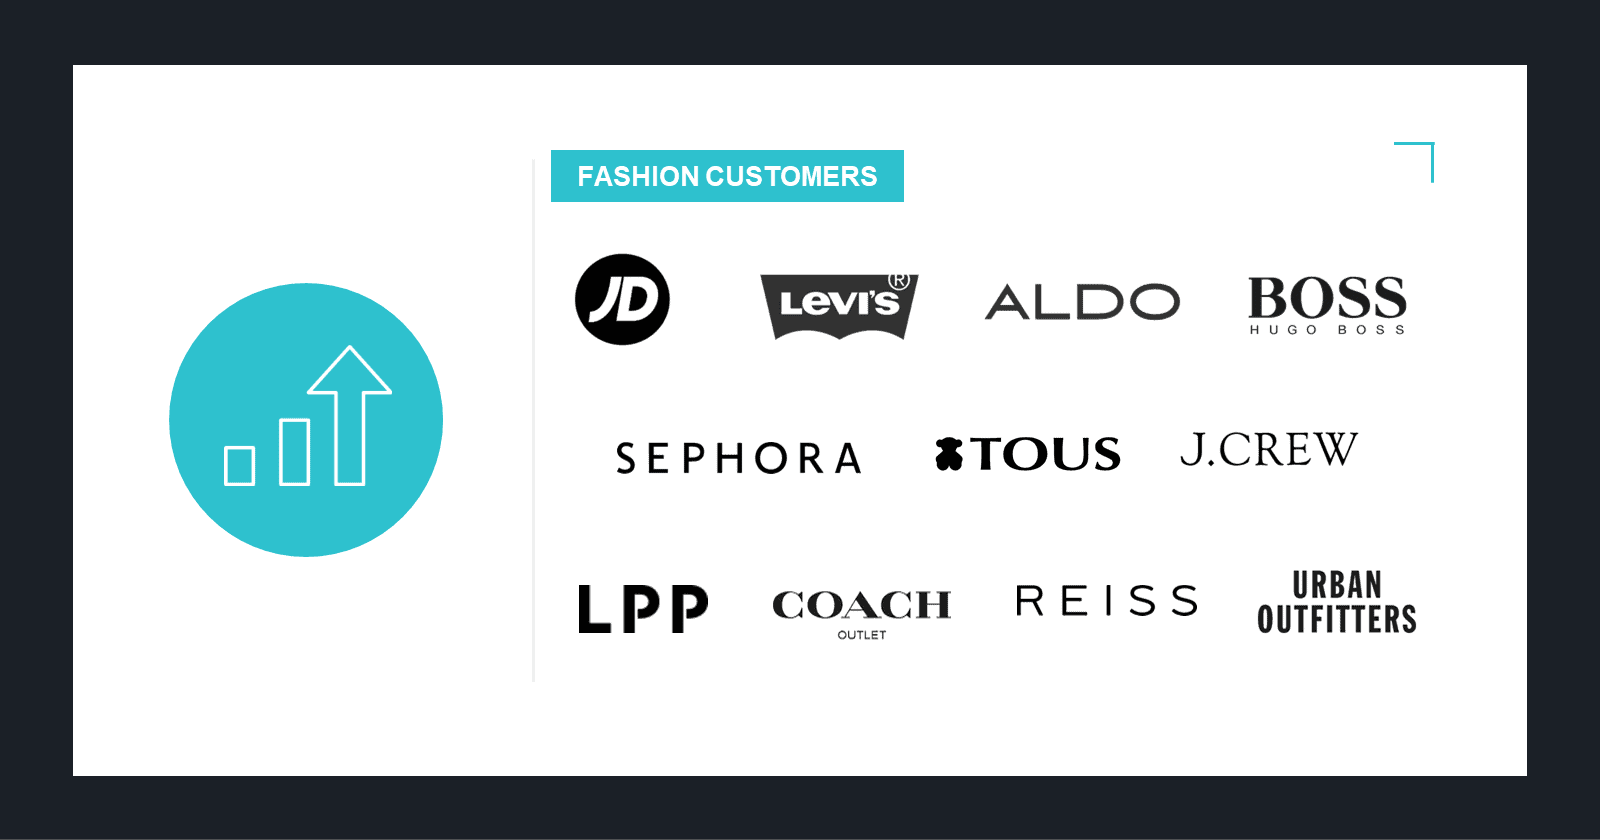 Scandit Fashion Customers